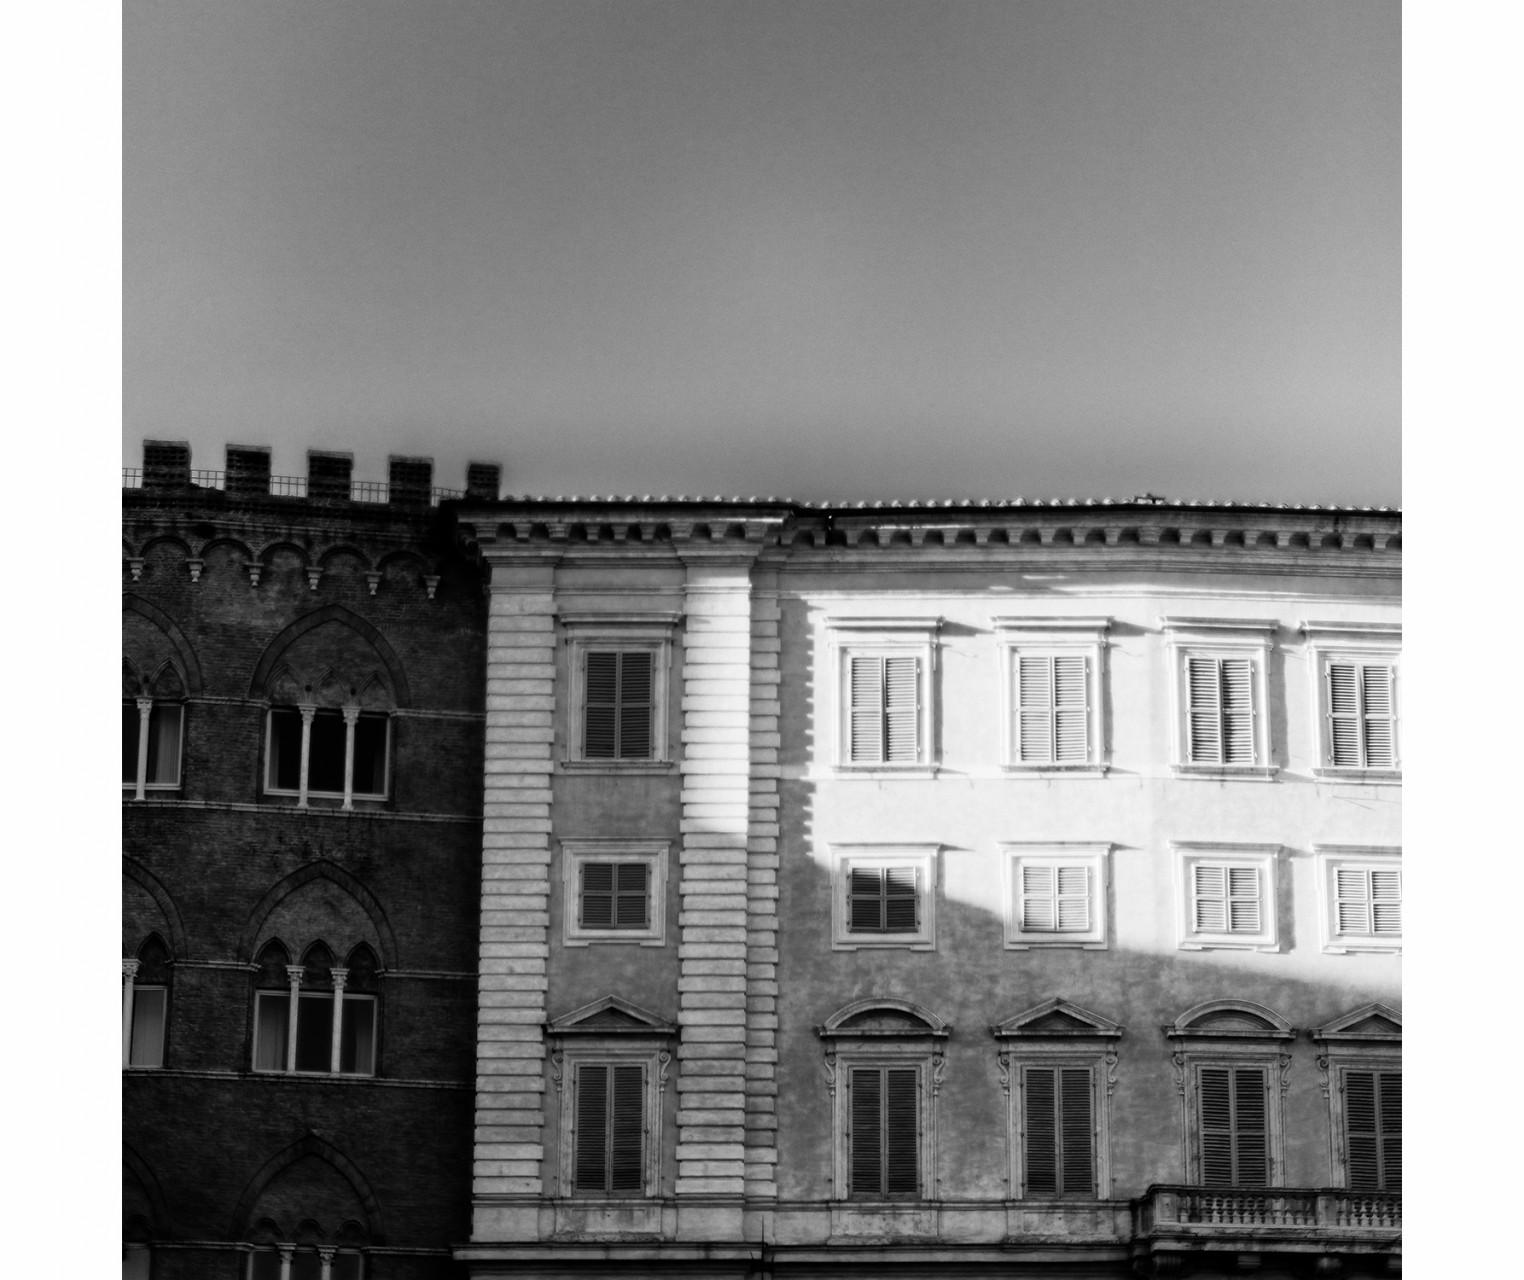 018_TuscanBuilding